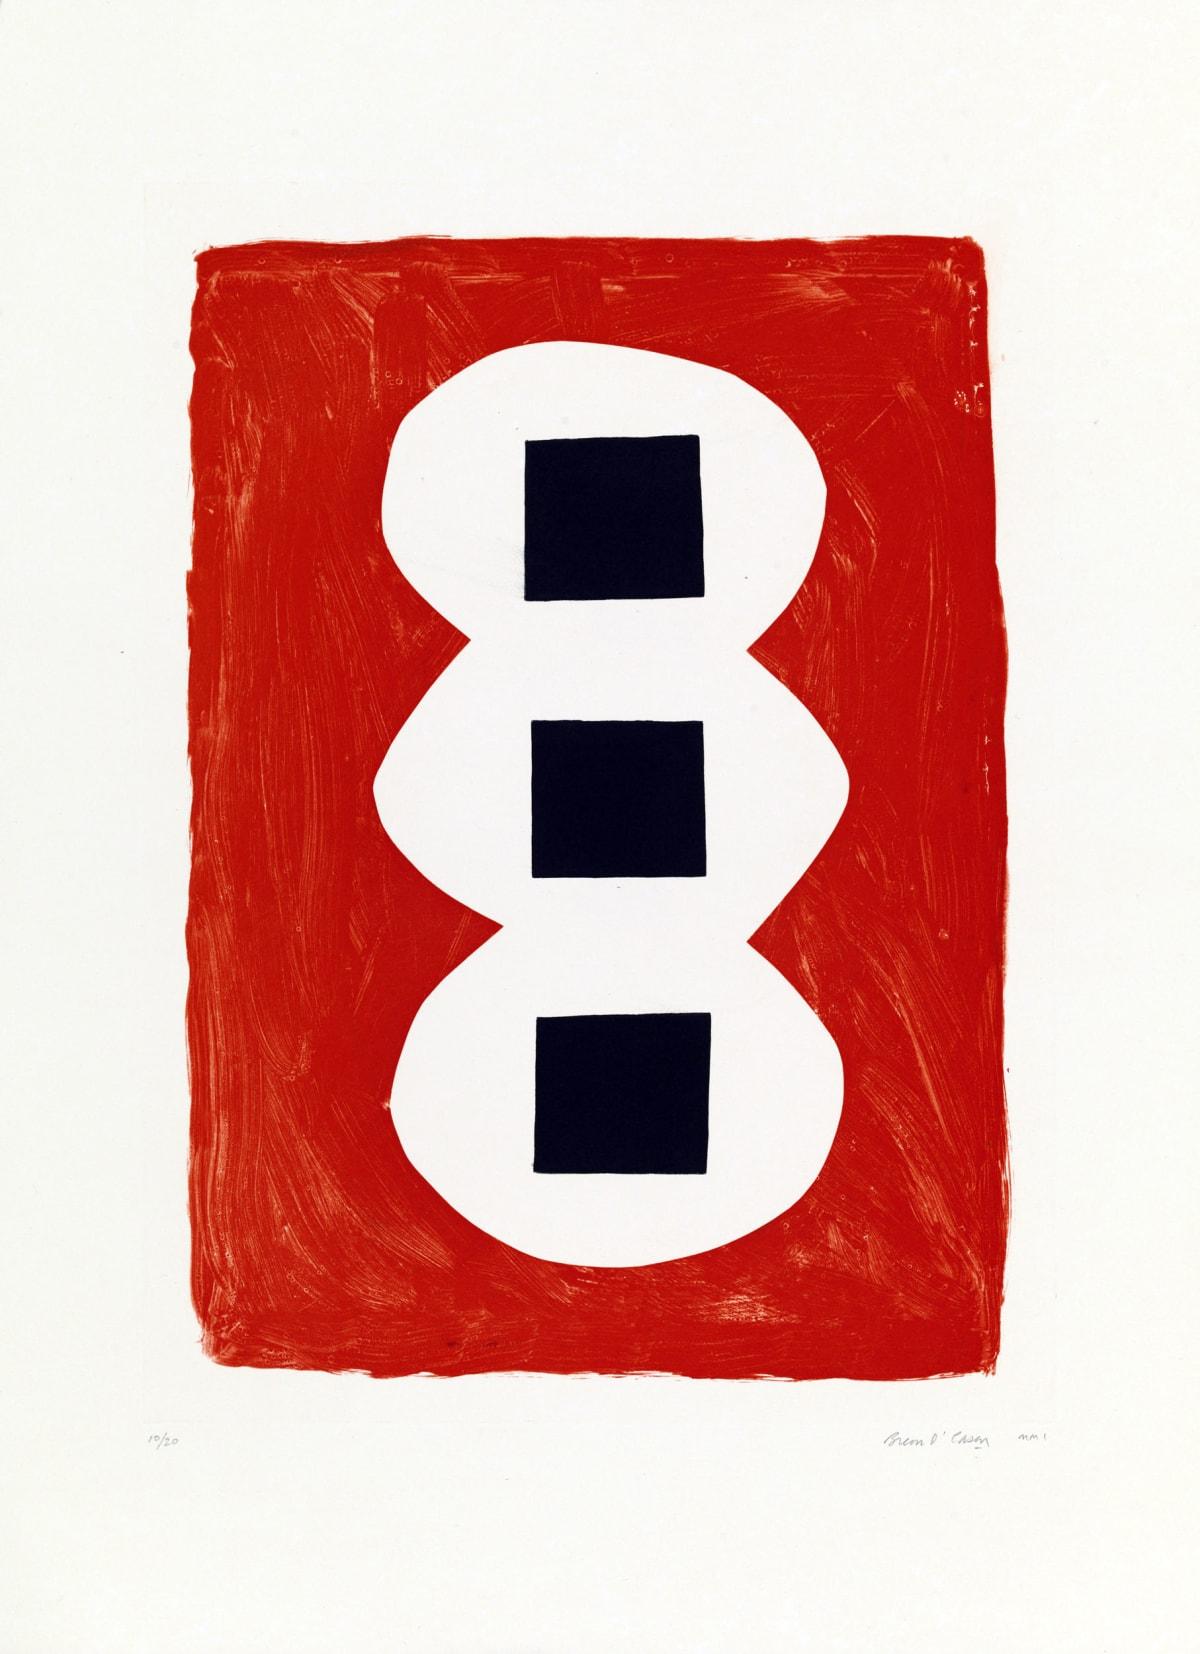 Breon O'Casey, Three Black Squares, 2001